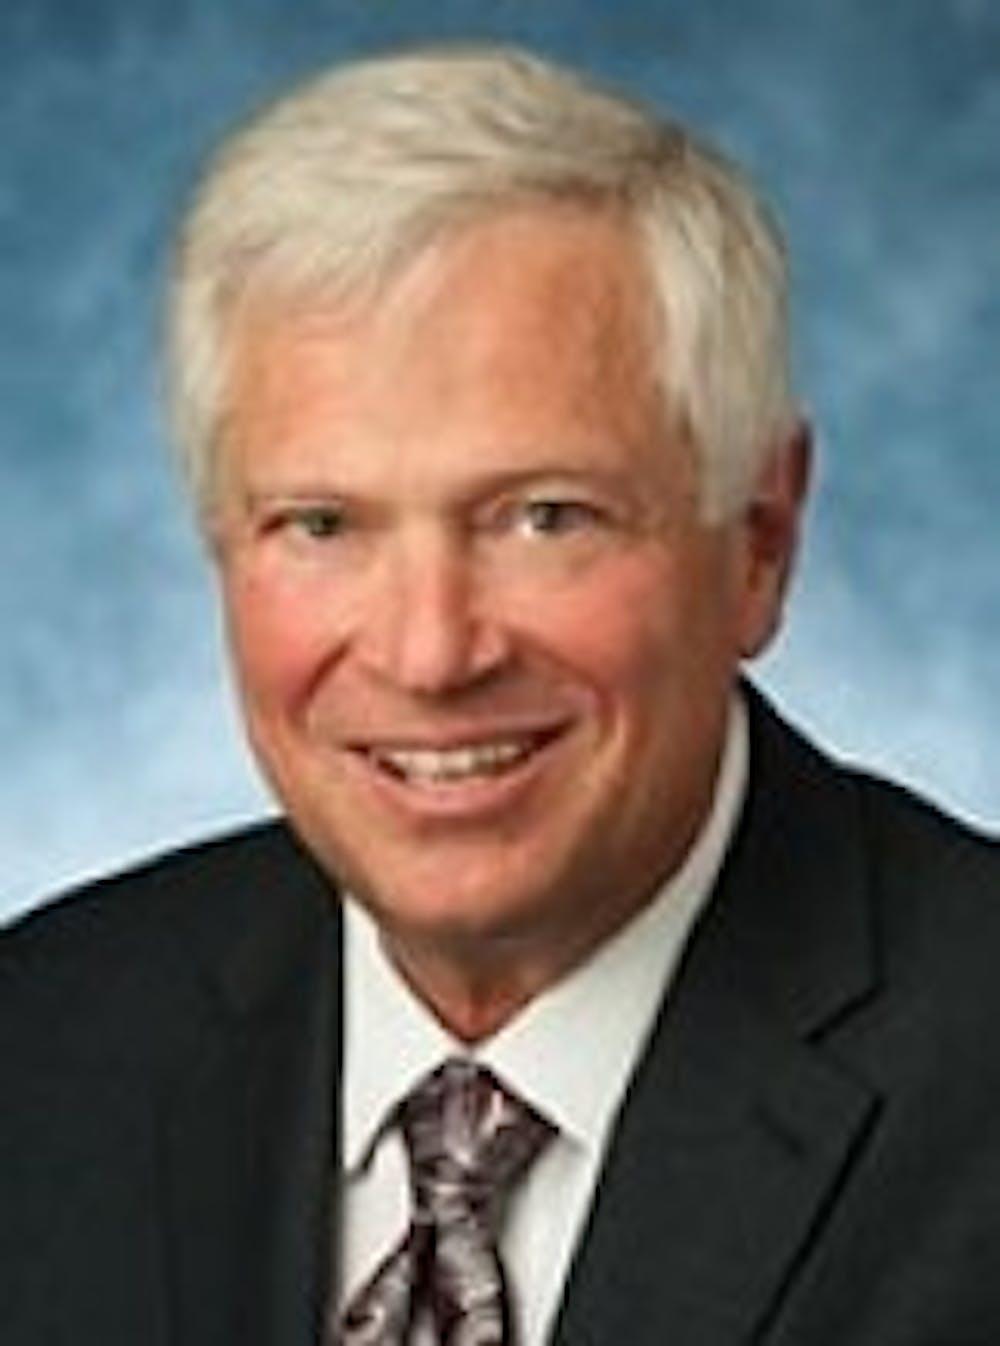 Penn names NYU professor Mark Wolff as new Dean of Penn